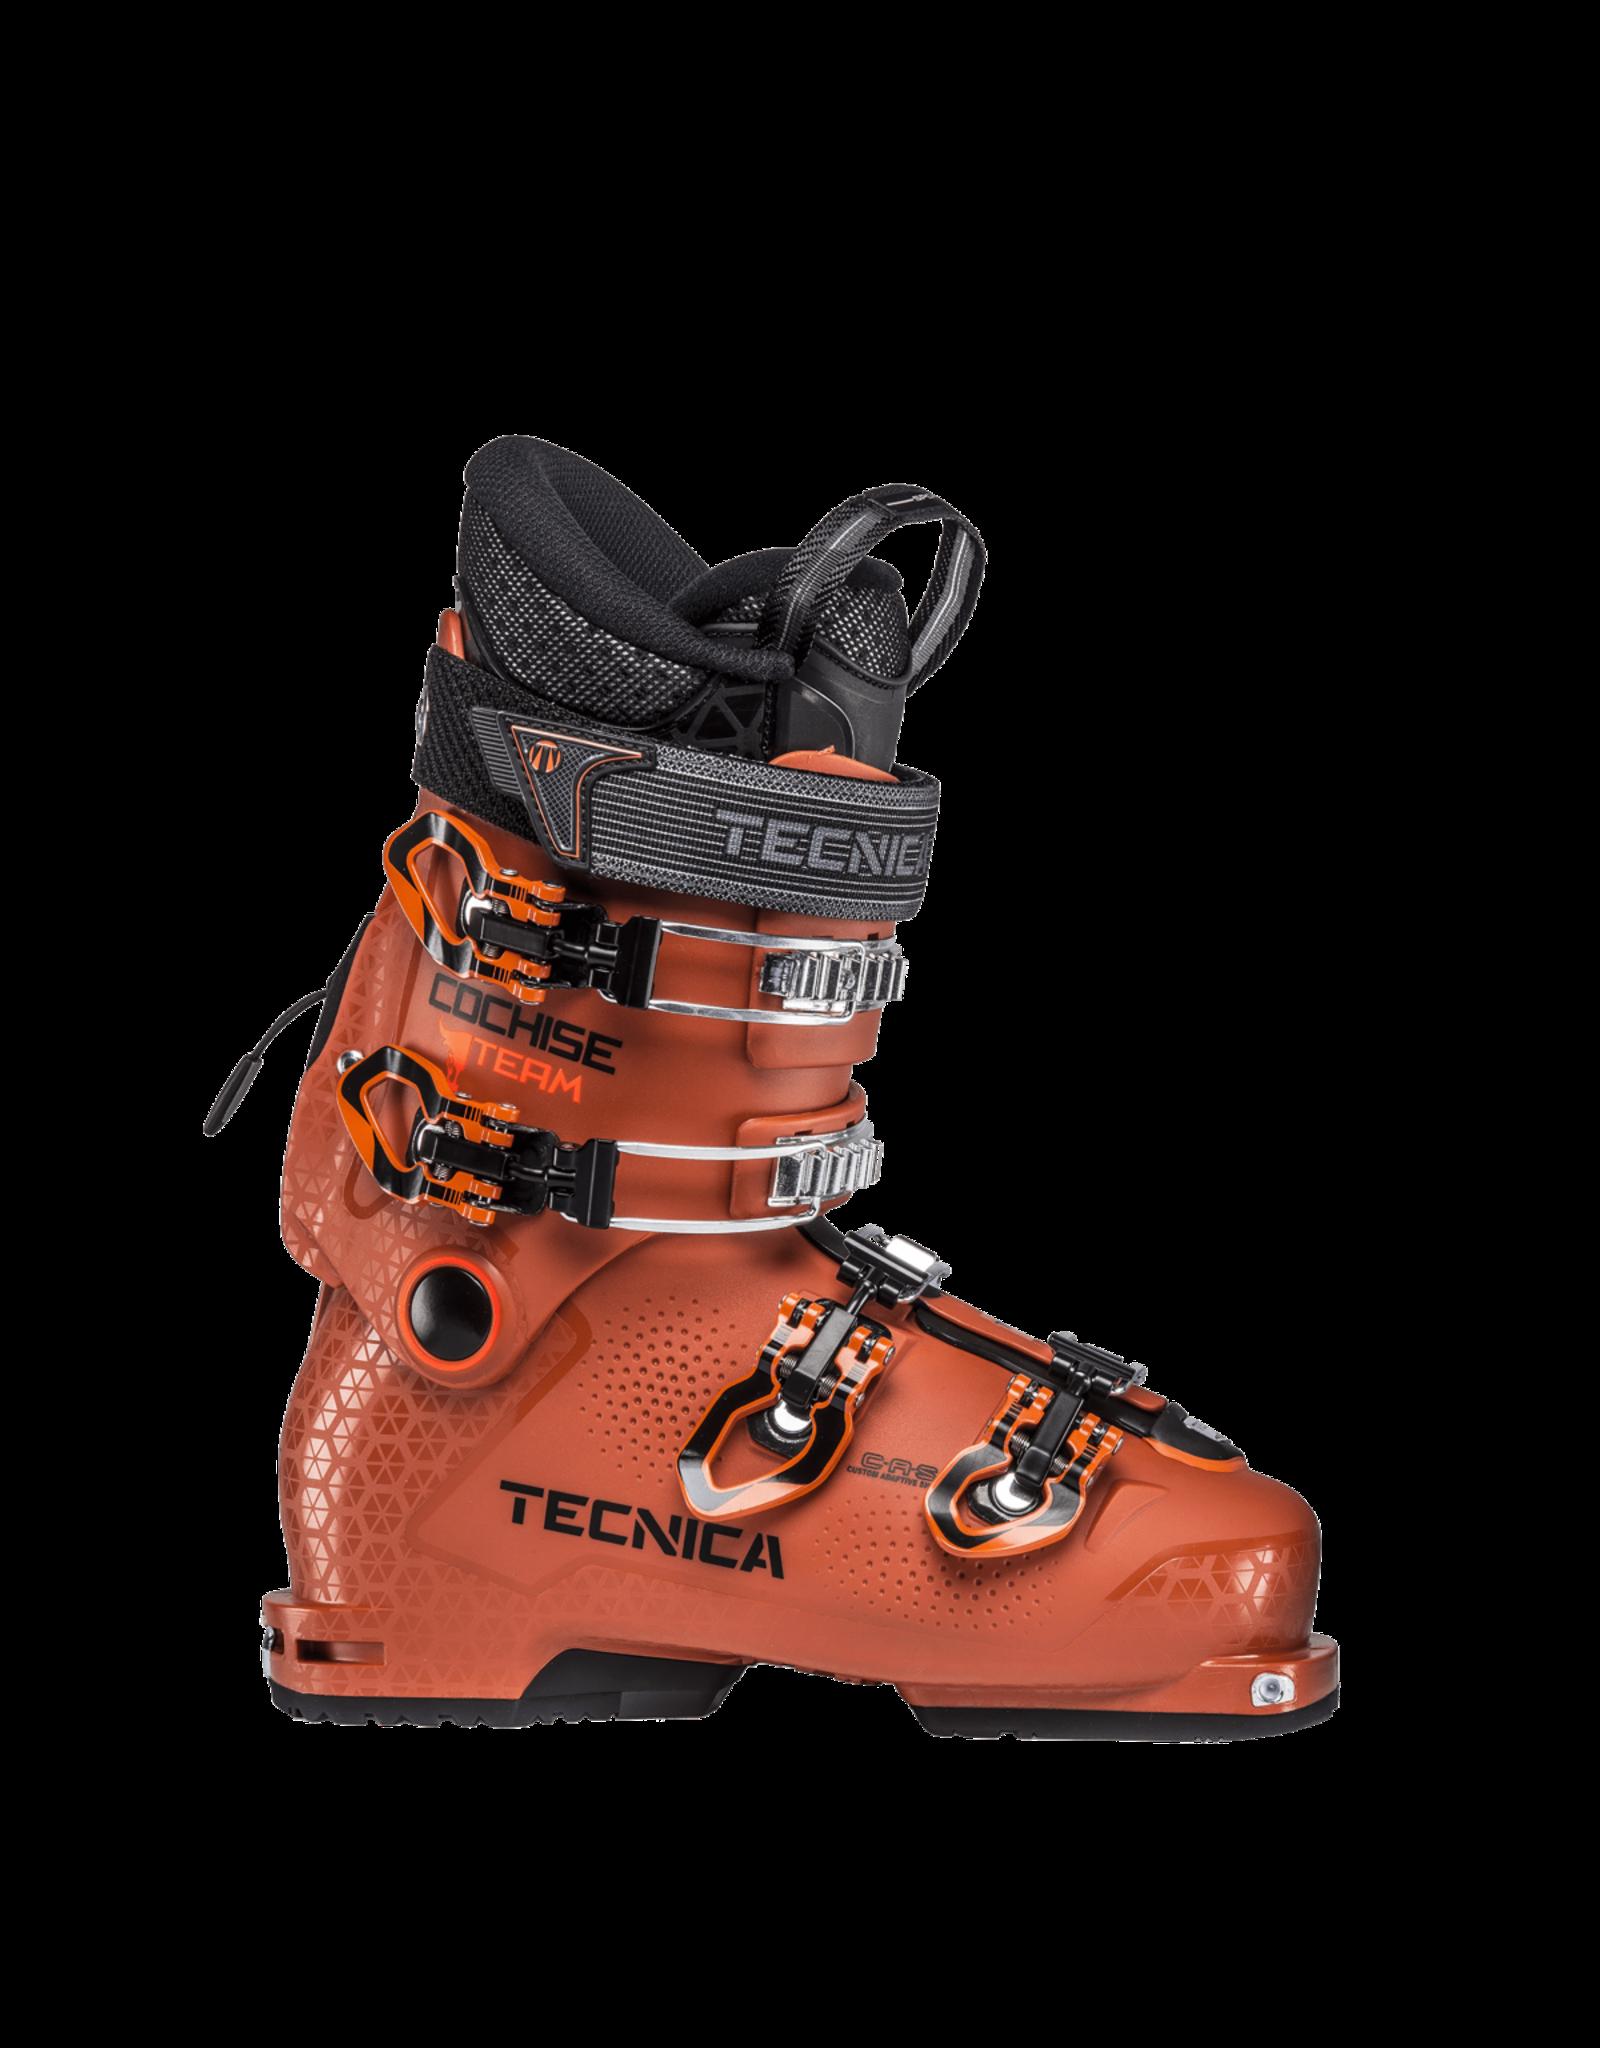 Tecnica Botte de ski Tecnica Cochise Team DYN - Enfants